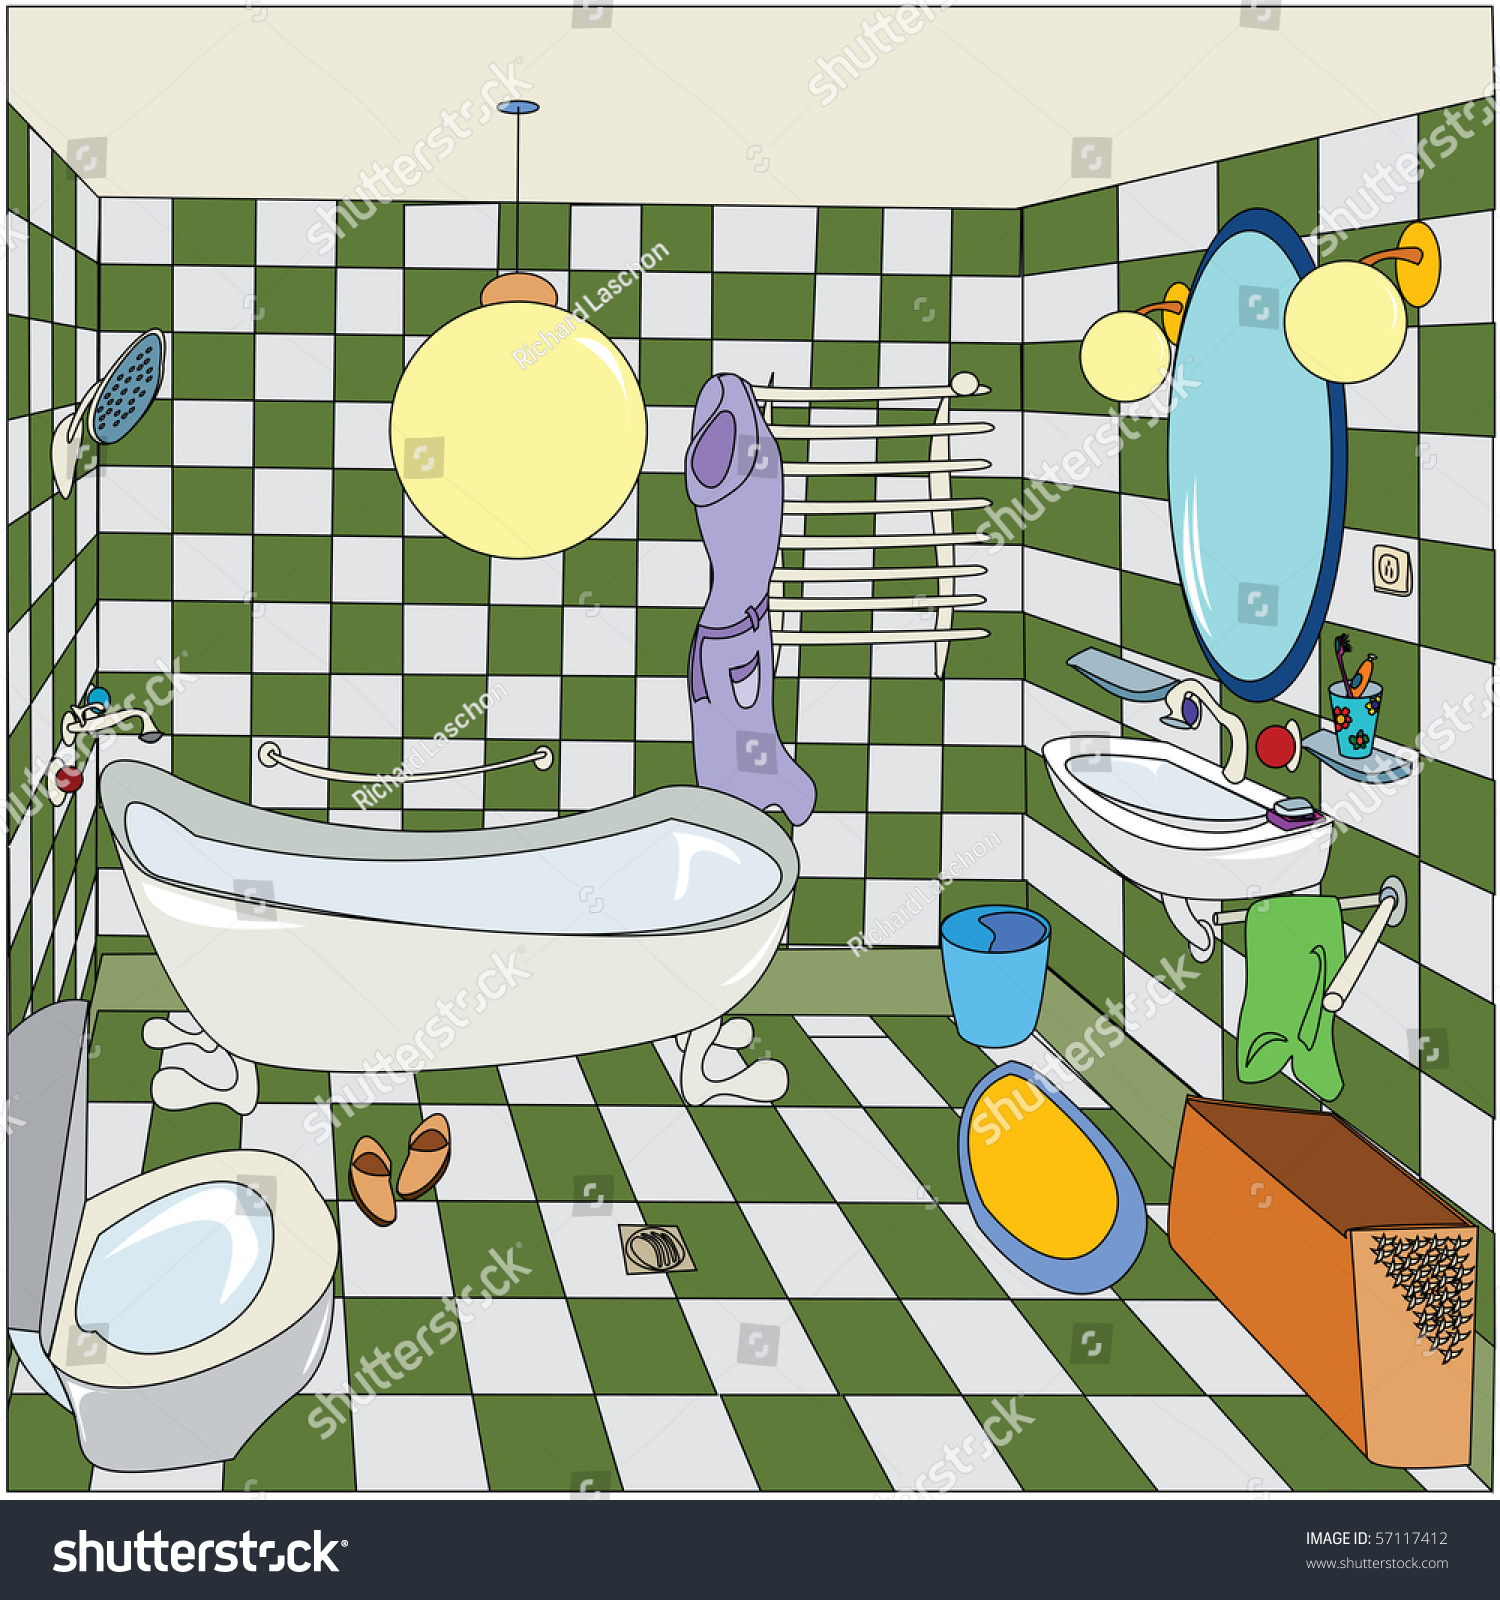 Cartoon Sketch Of A Bathroom Stock Photo 57117412 ...